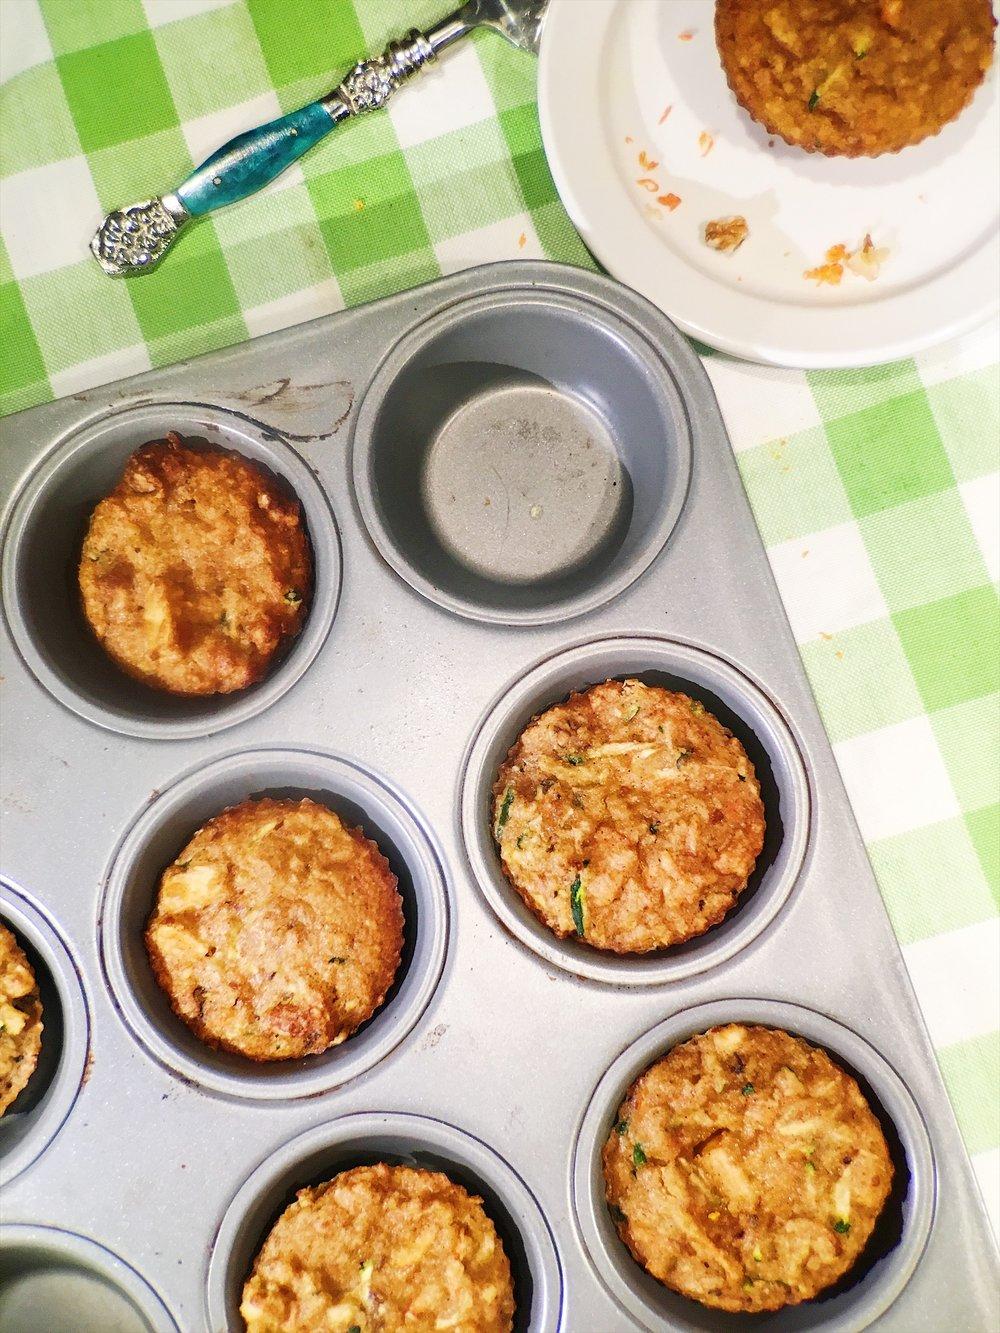 Gluten-Free Zucchini Walnut Muffins